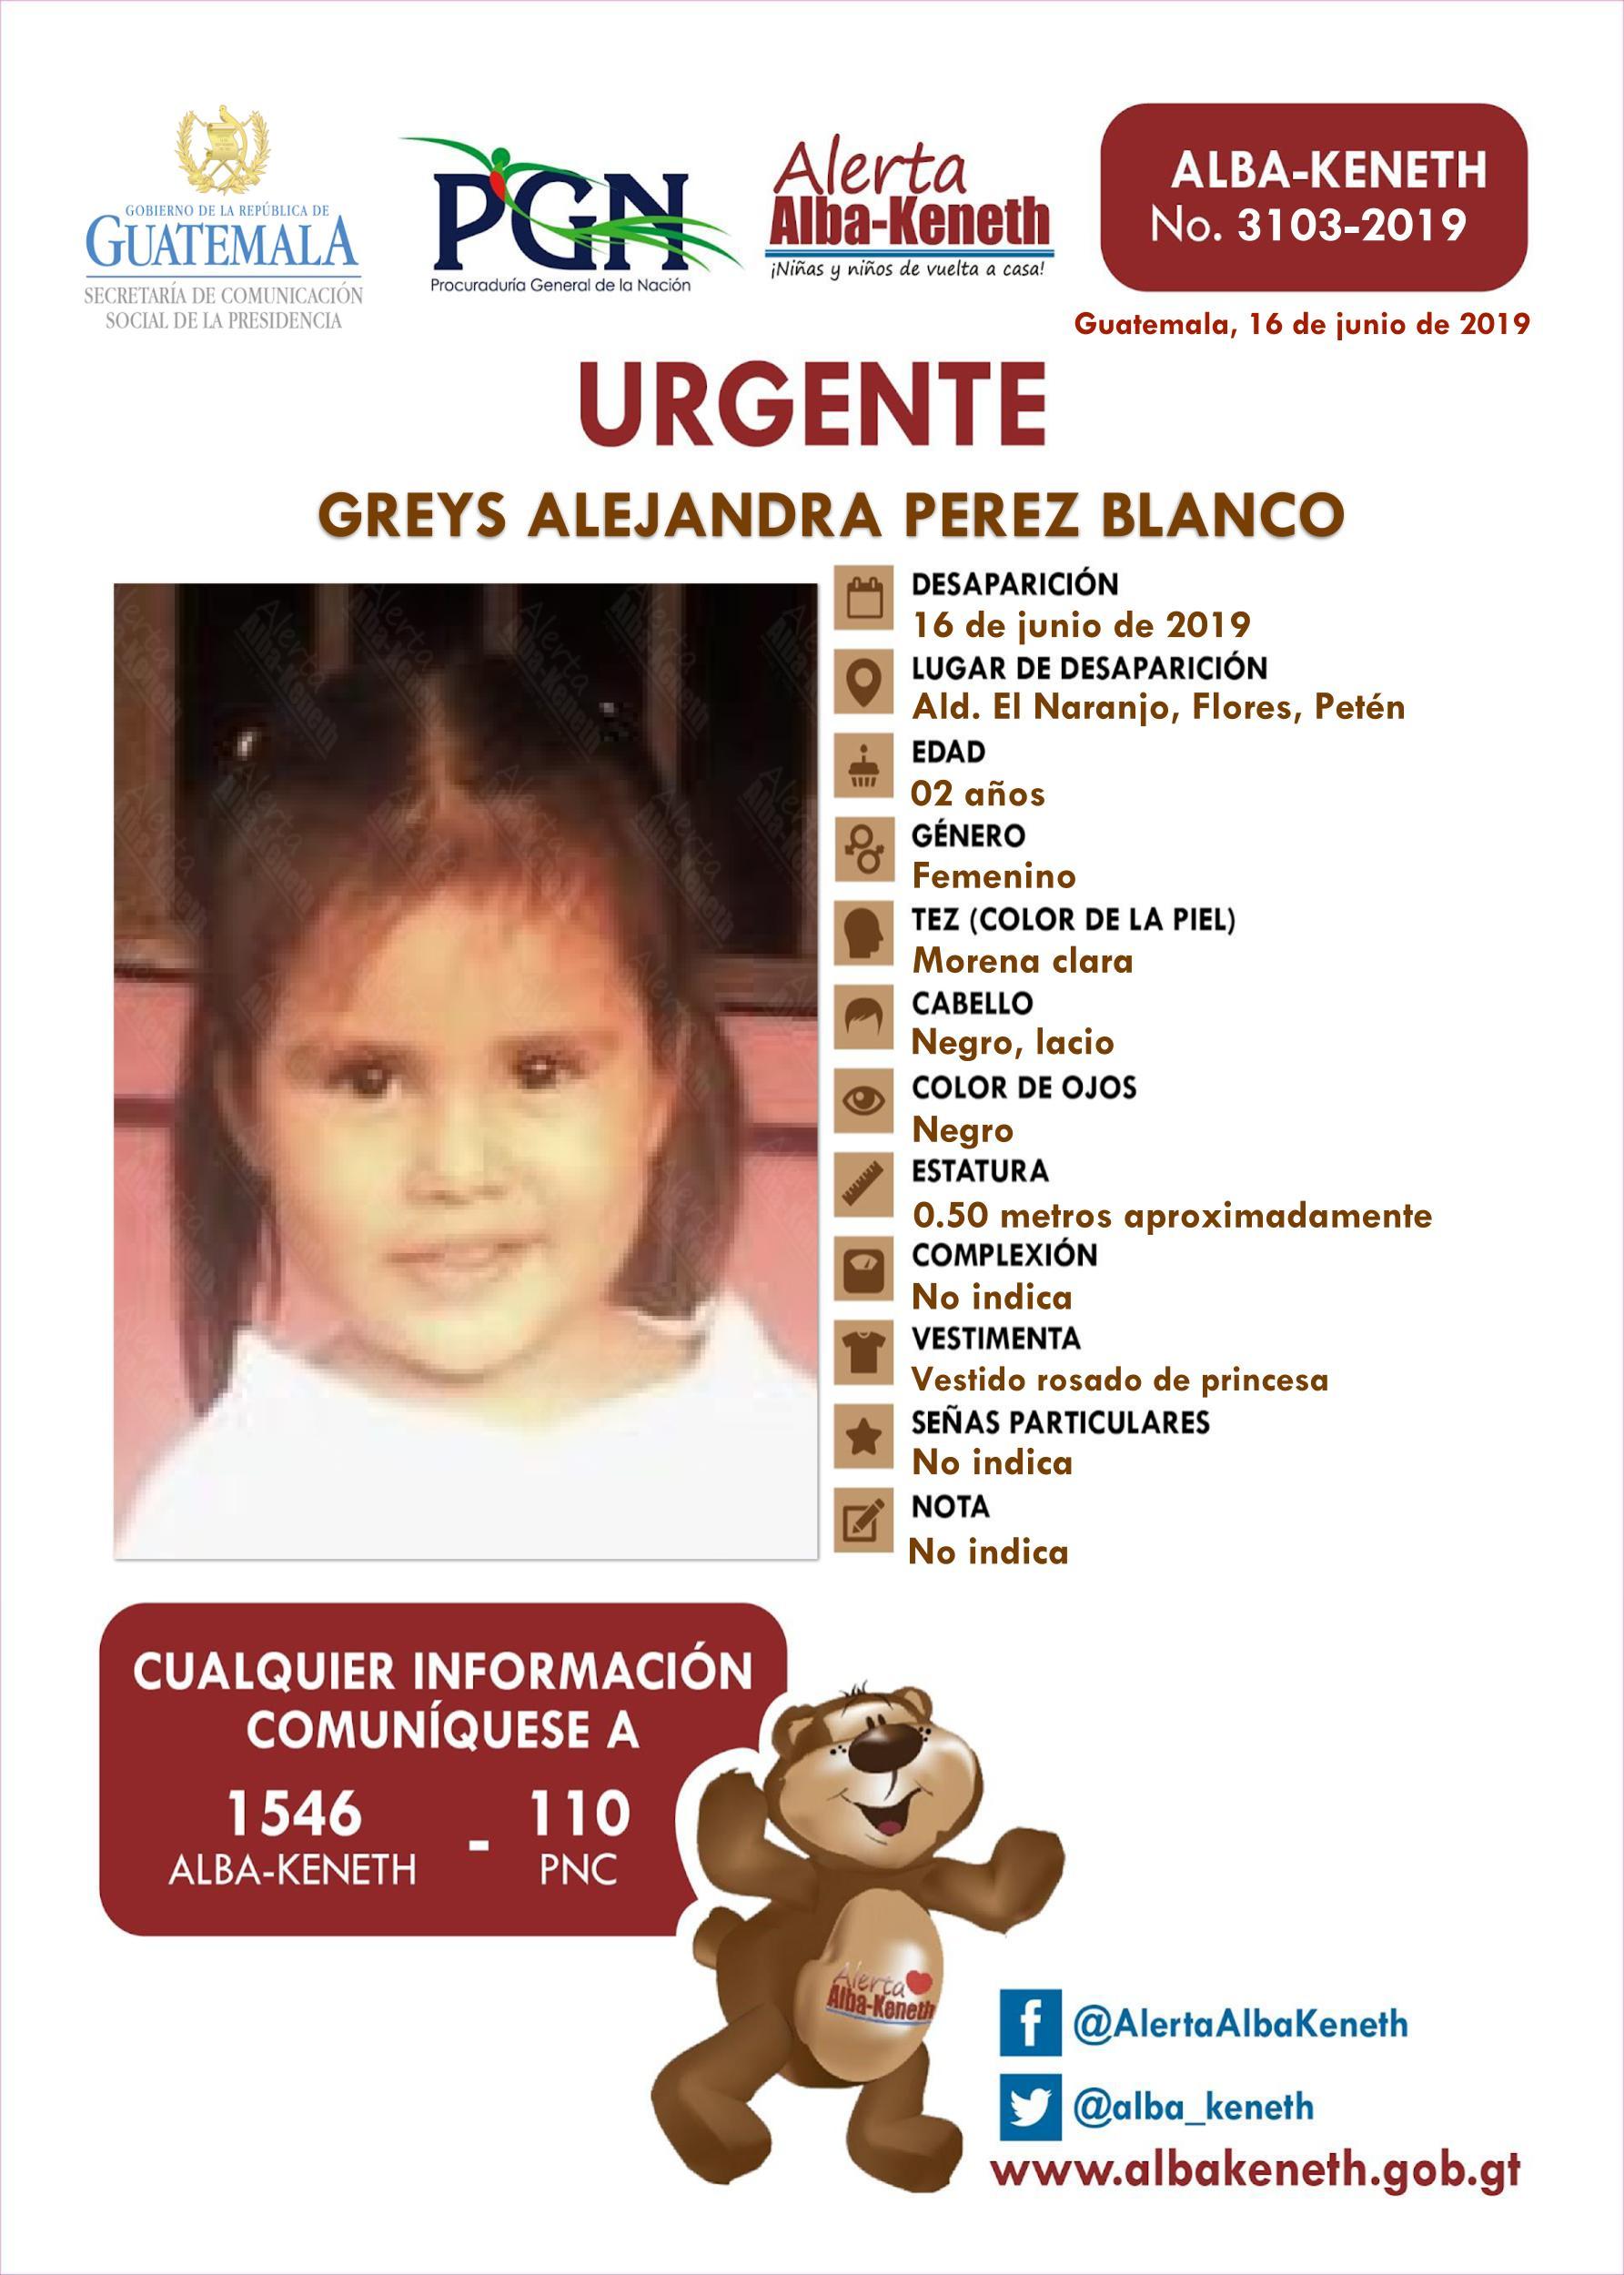 Greys Alejandra Perez Blanco